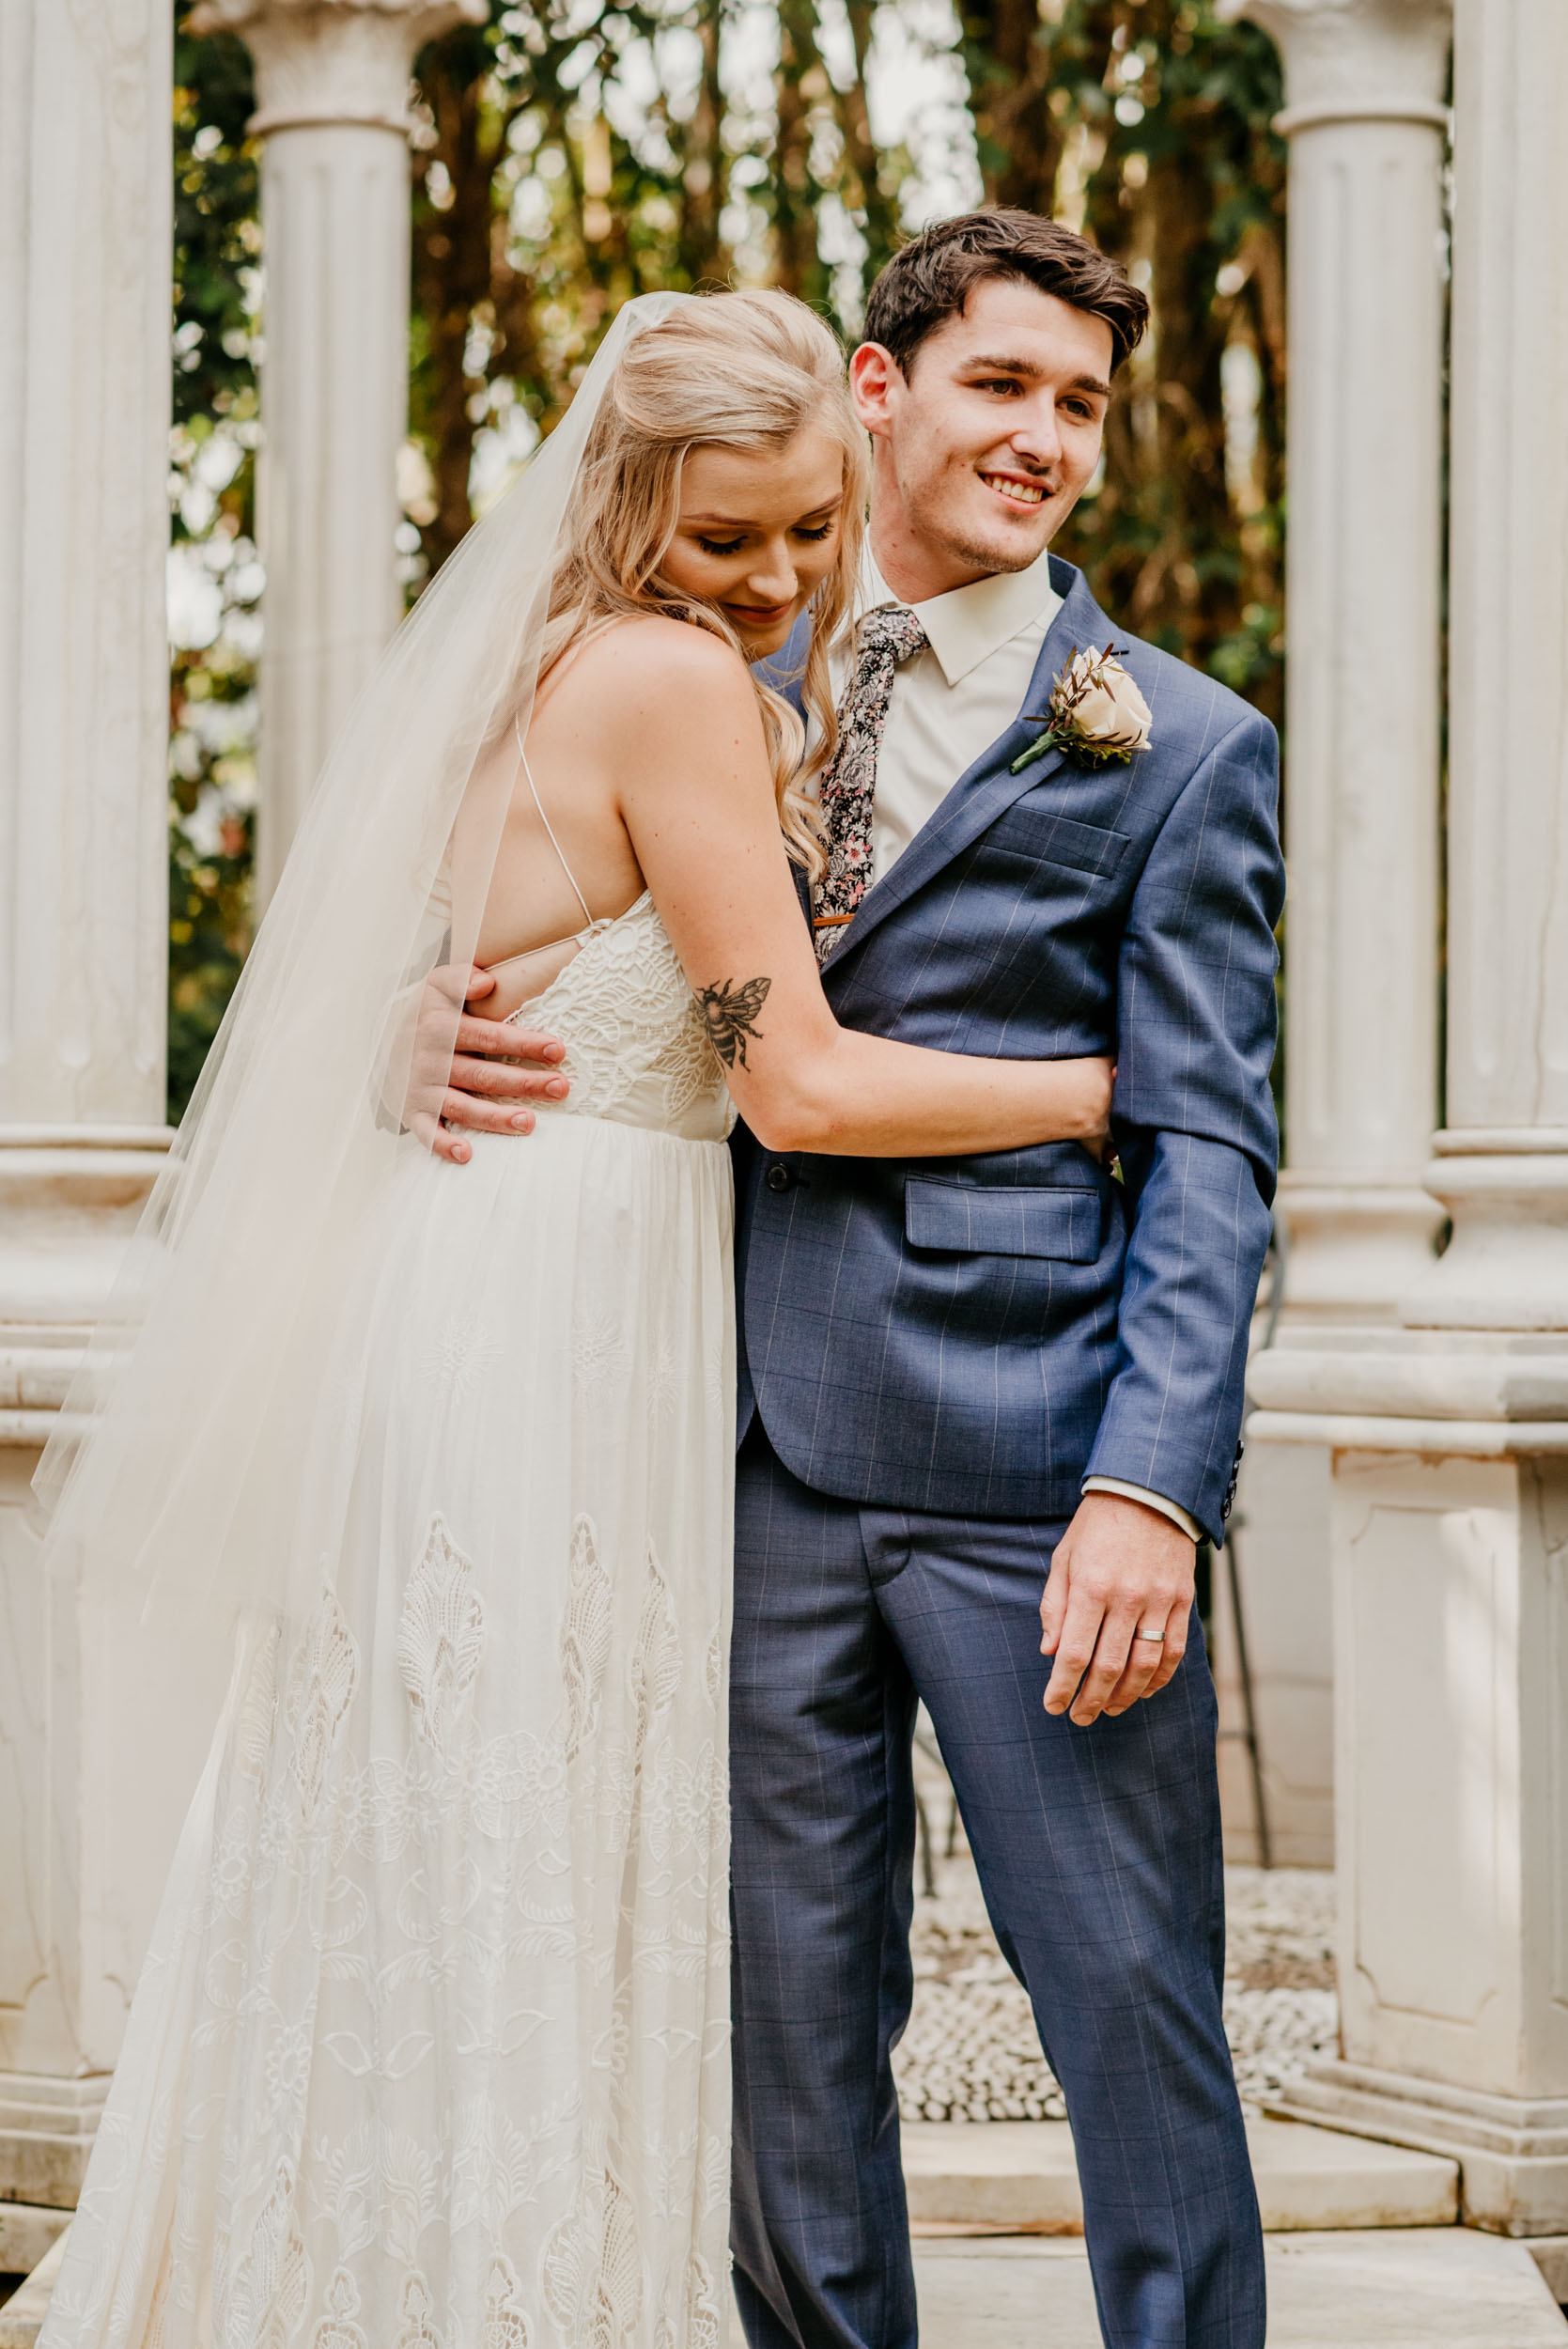 The Raw Photographer - Cairns Wedding Photographer - Laloli - Cairns Garden Wedding - Wedding Dress-47.jpg